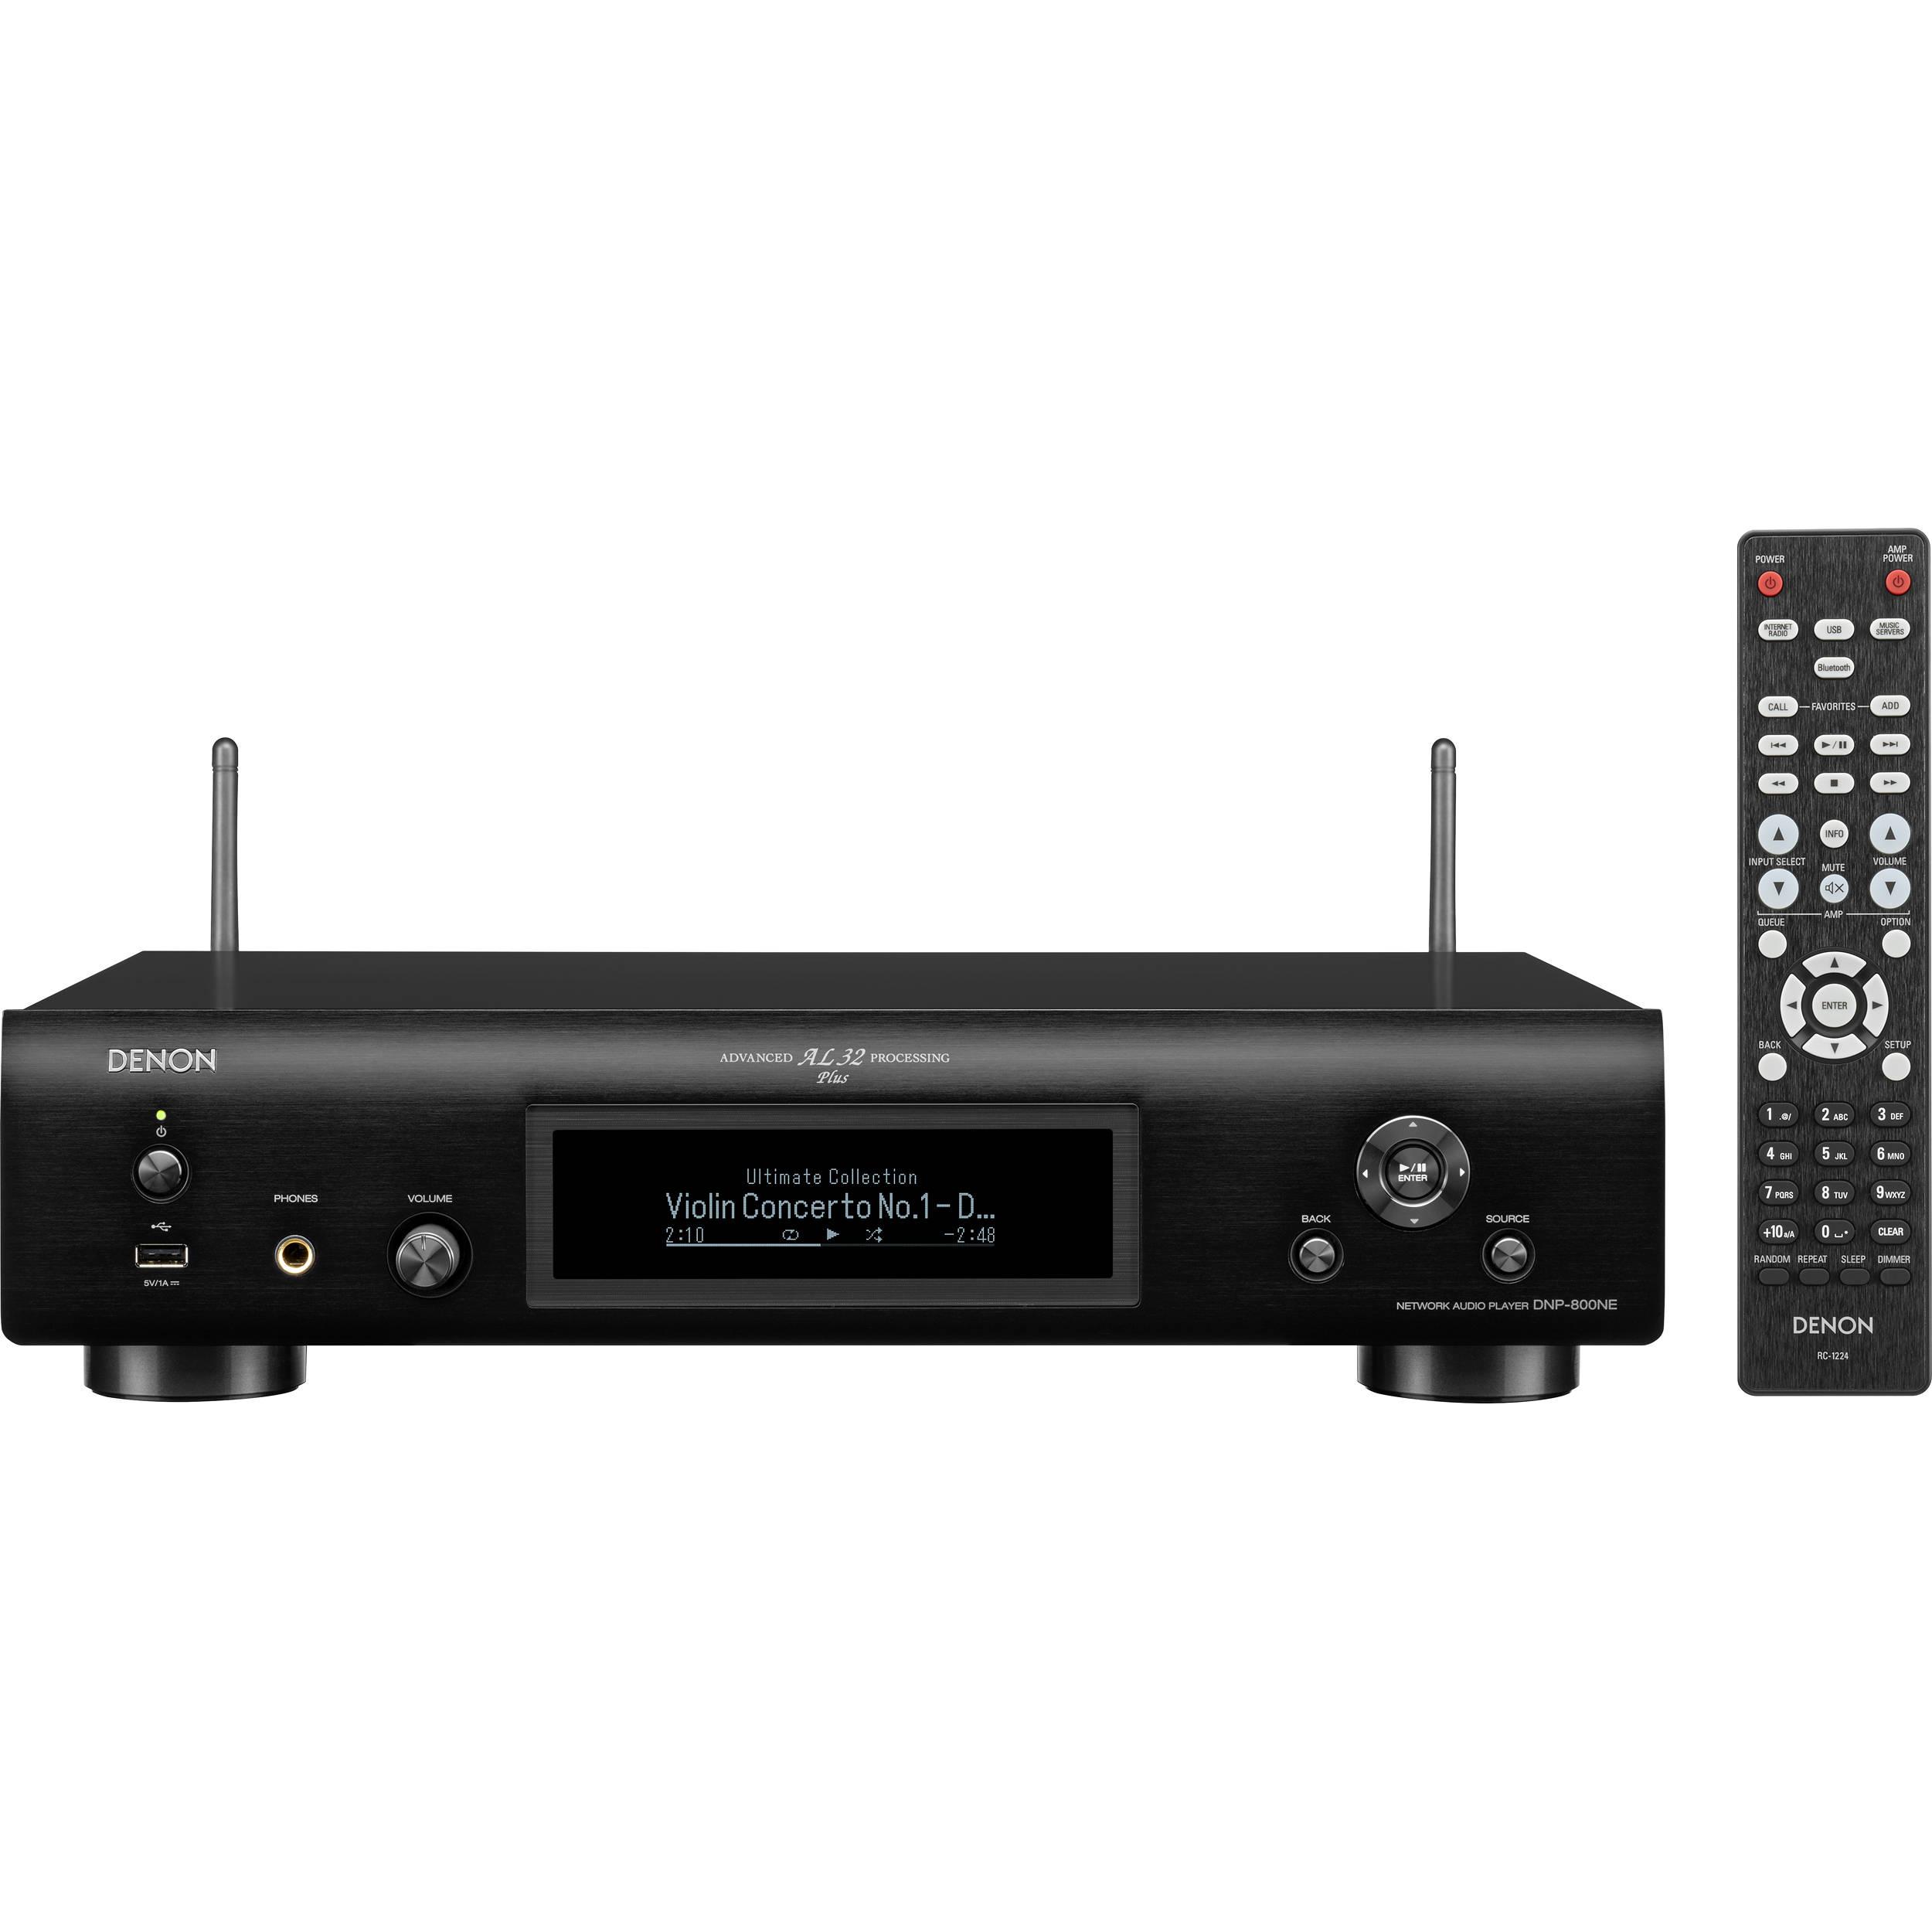 Denon DNP-800NE Network Audio Player DNP800NEBKE3 B&H Photo